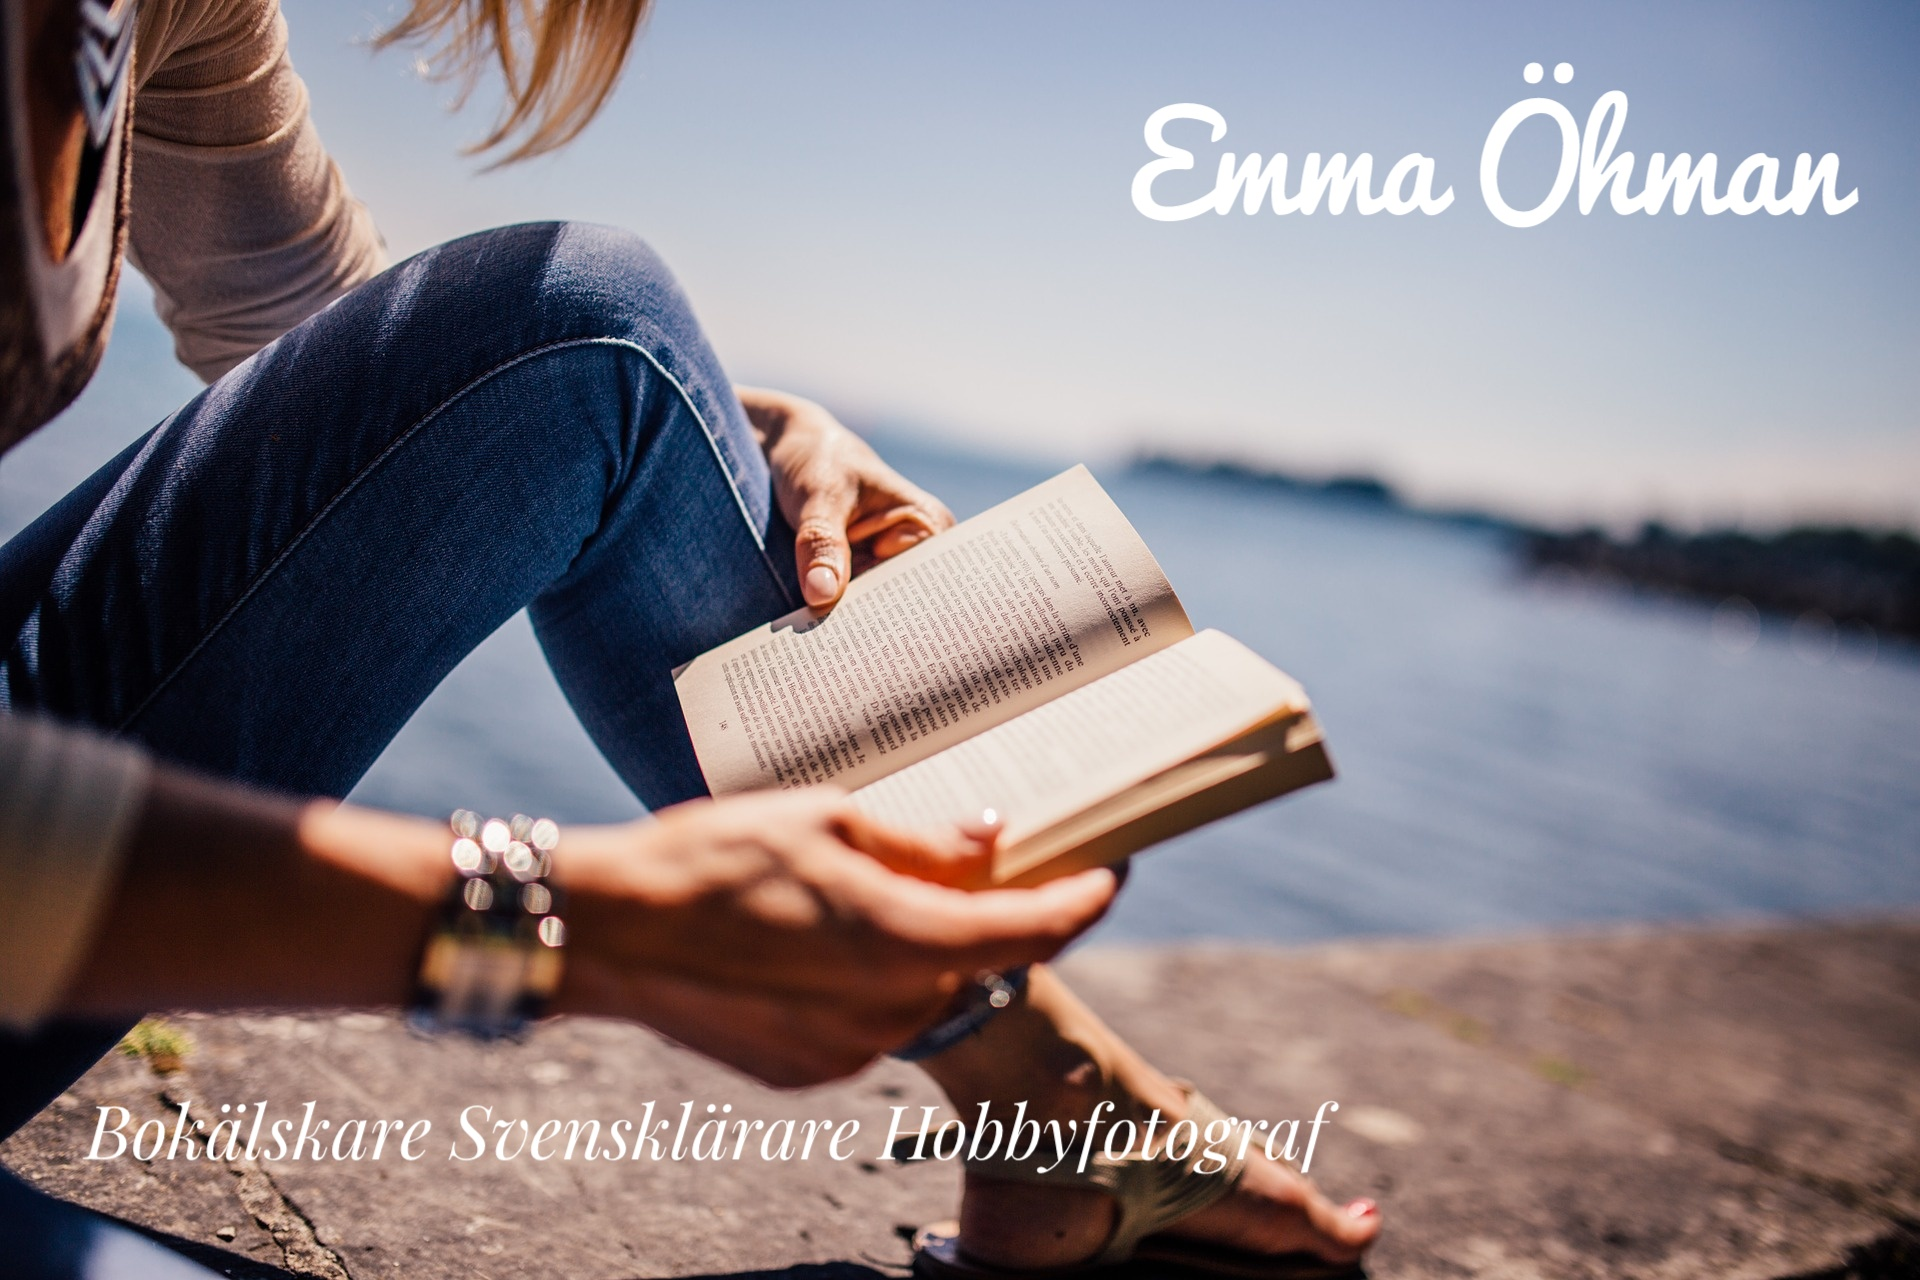 Emma Öhman